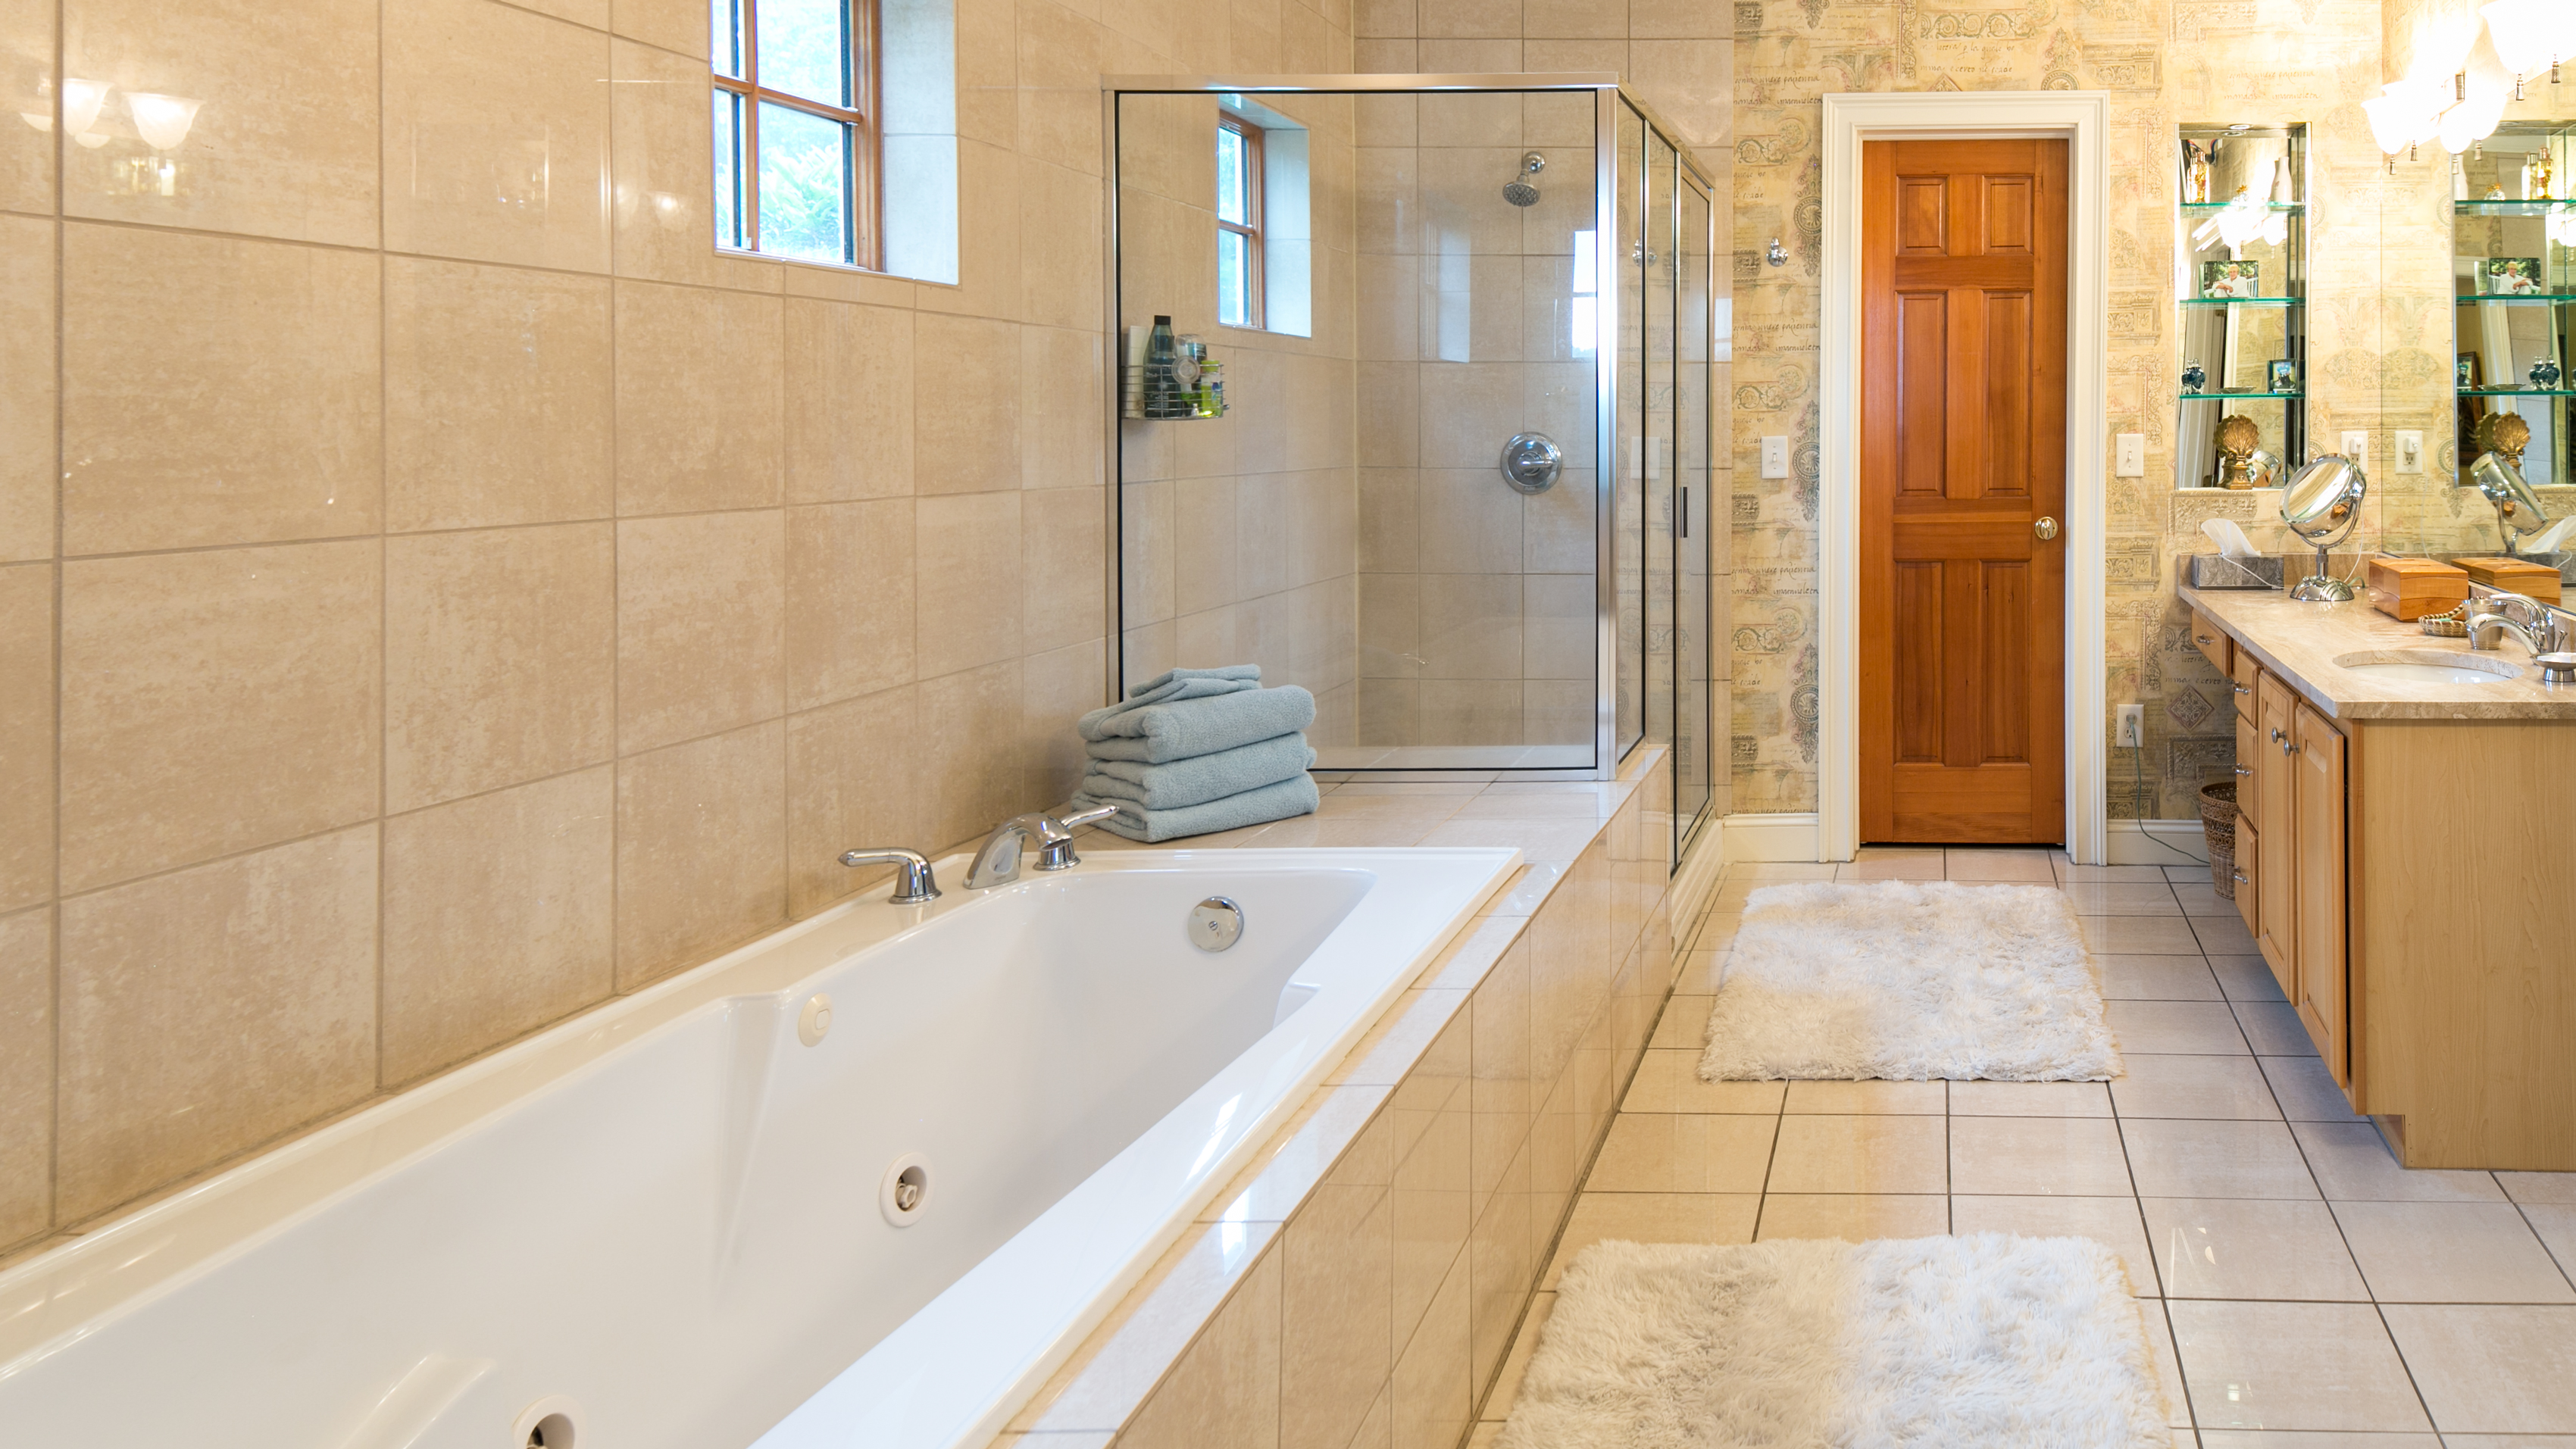 Master-Bathroom-4_111-Westridge-Court-Chapin-SC-29036_Wellman-Realty